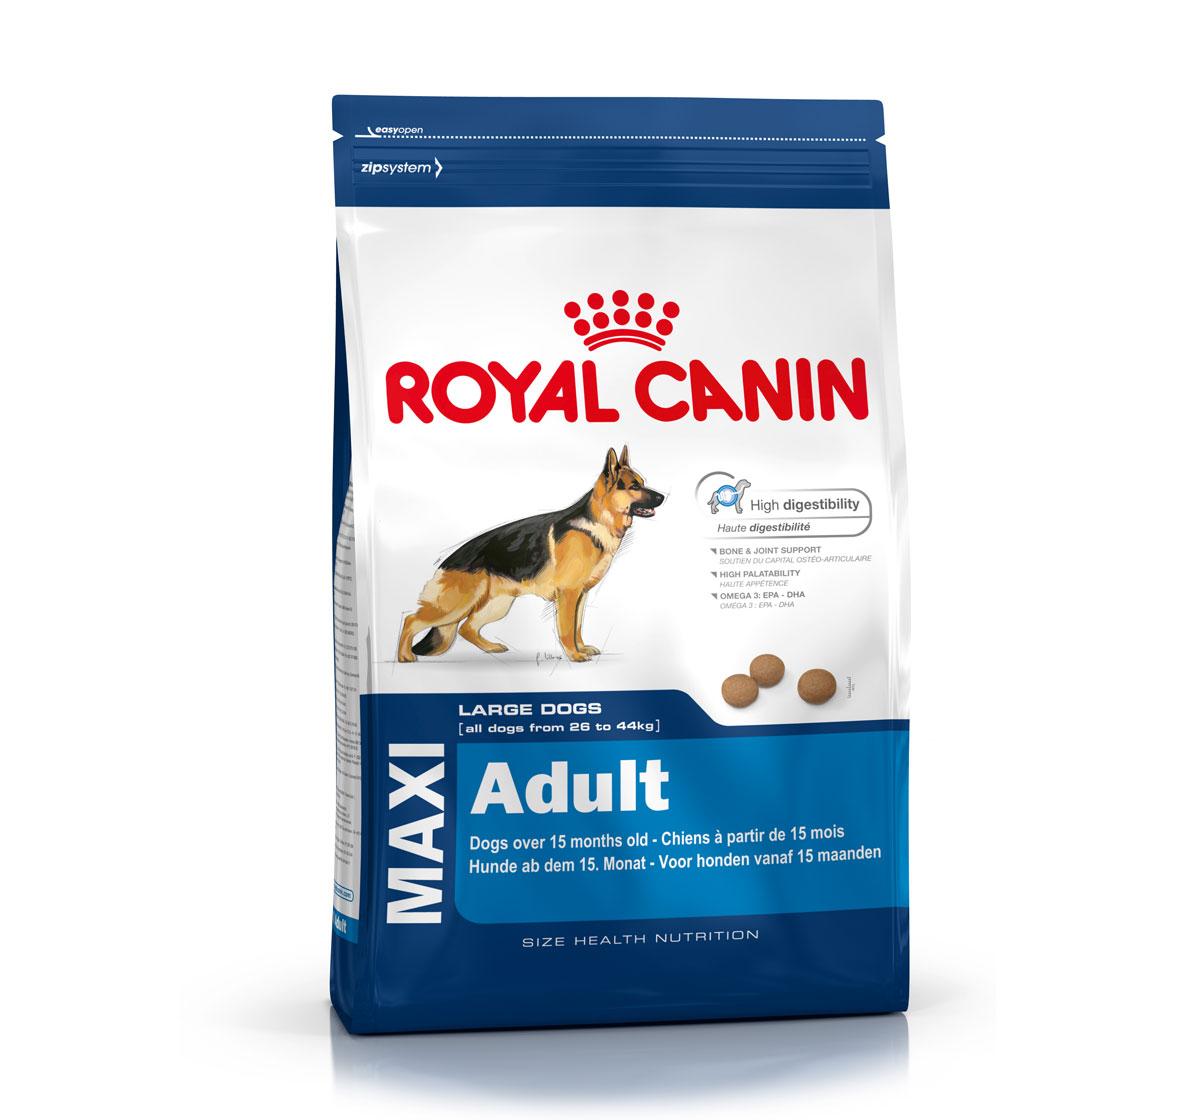 royal canin maxi adult 4 kg dogspot online pet supply store. Black Bedroom Furniture Sets. Home Design Ideas